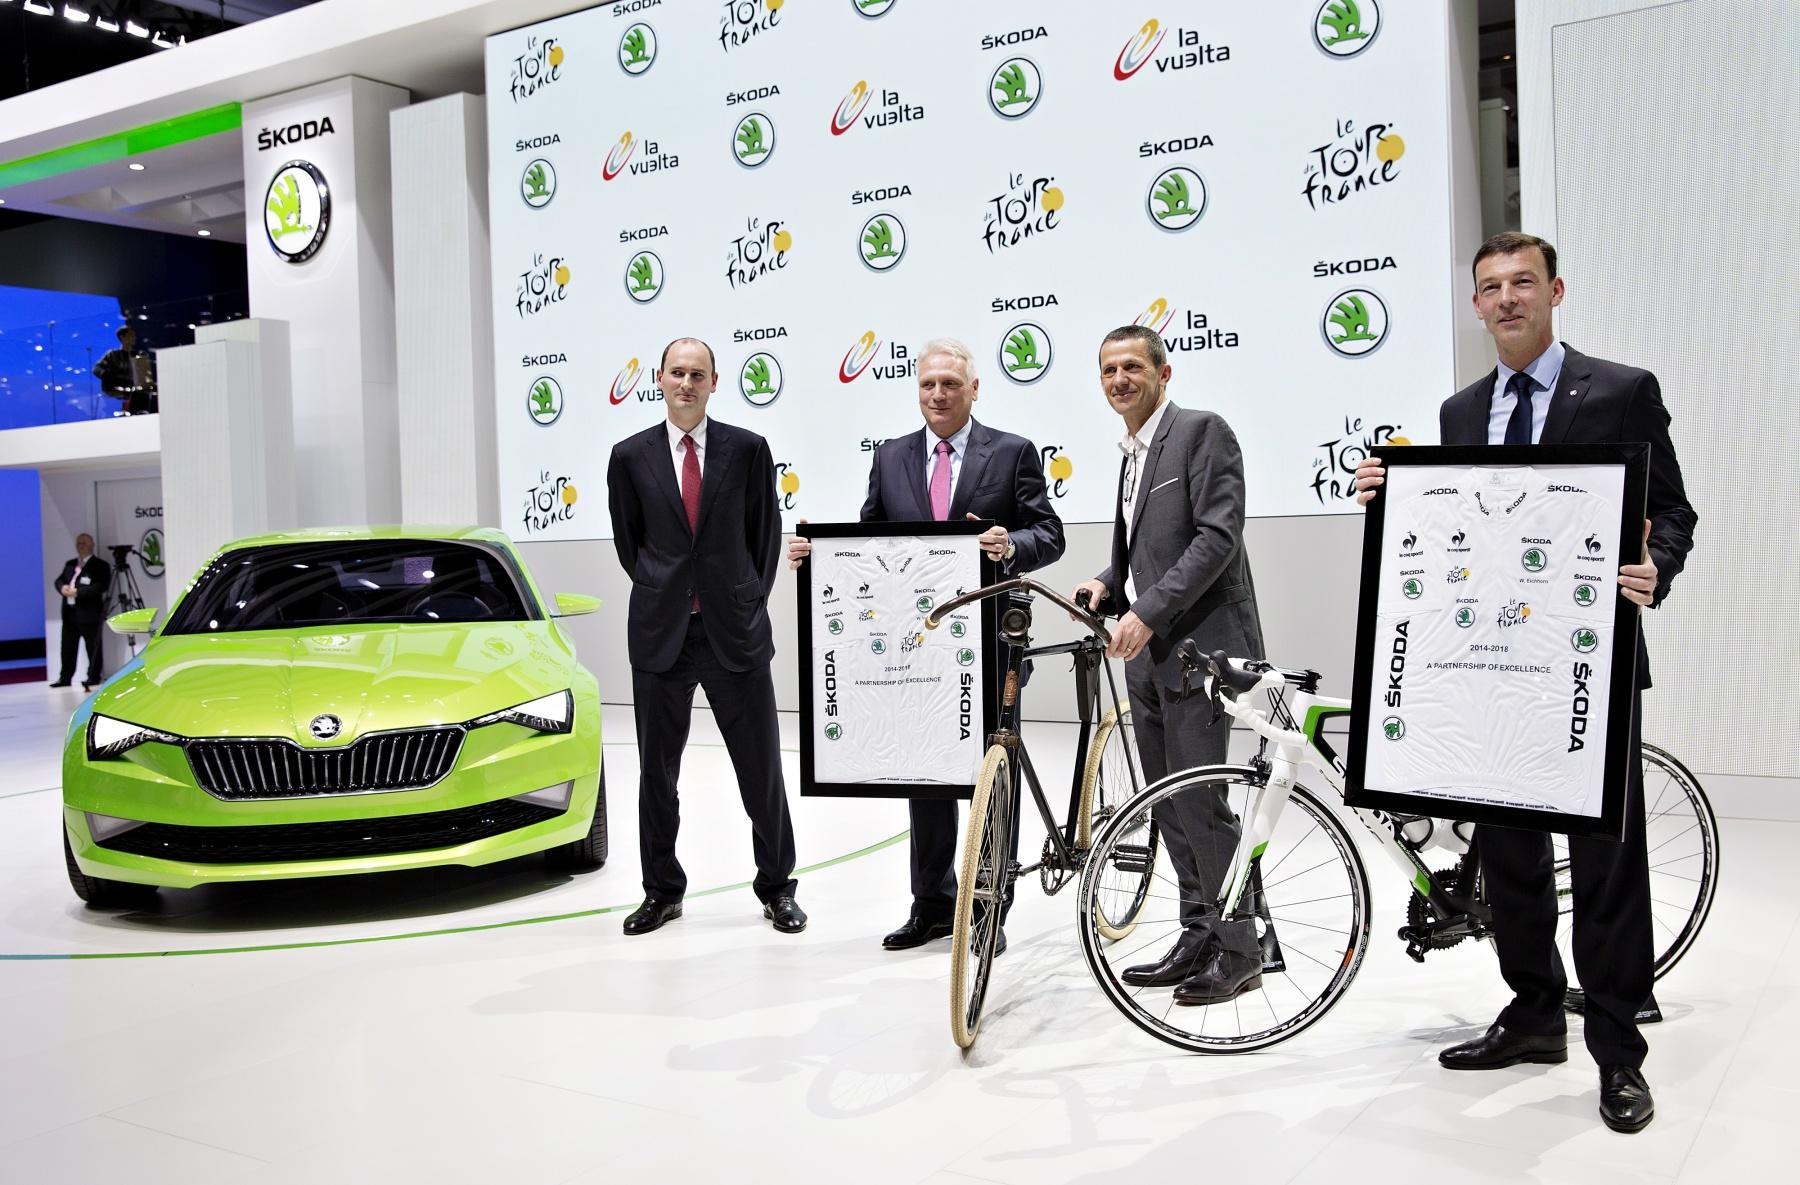 140304 SKODA - official partner Tour de France till 2018 002